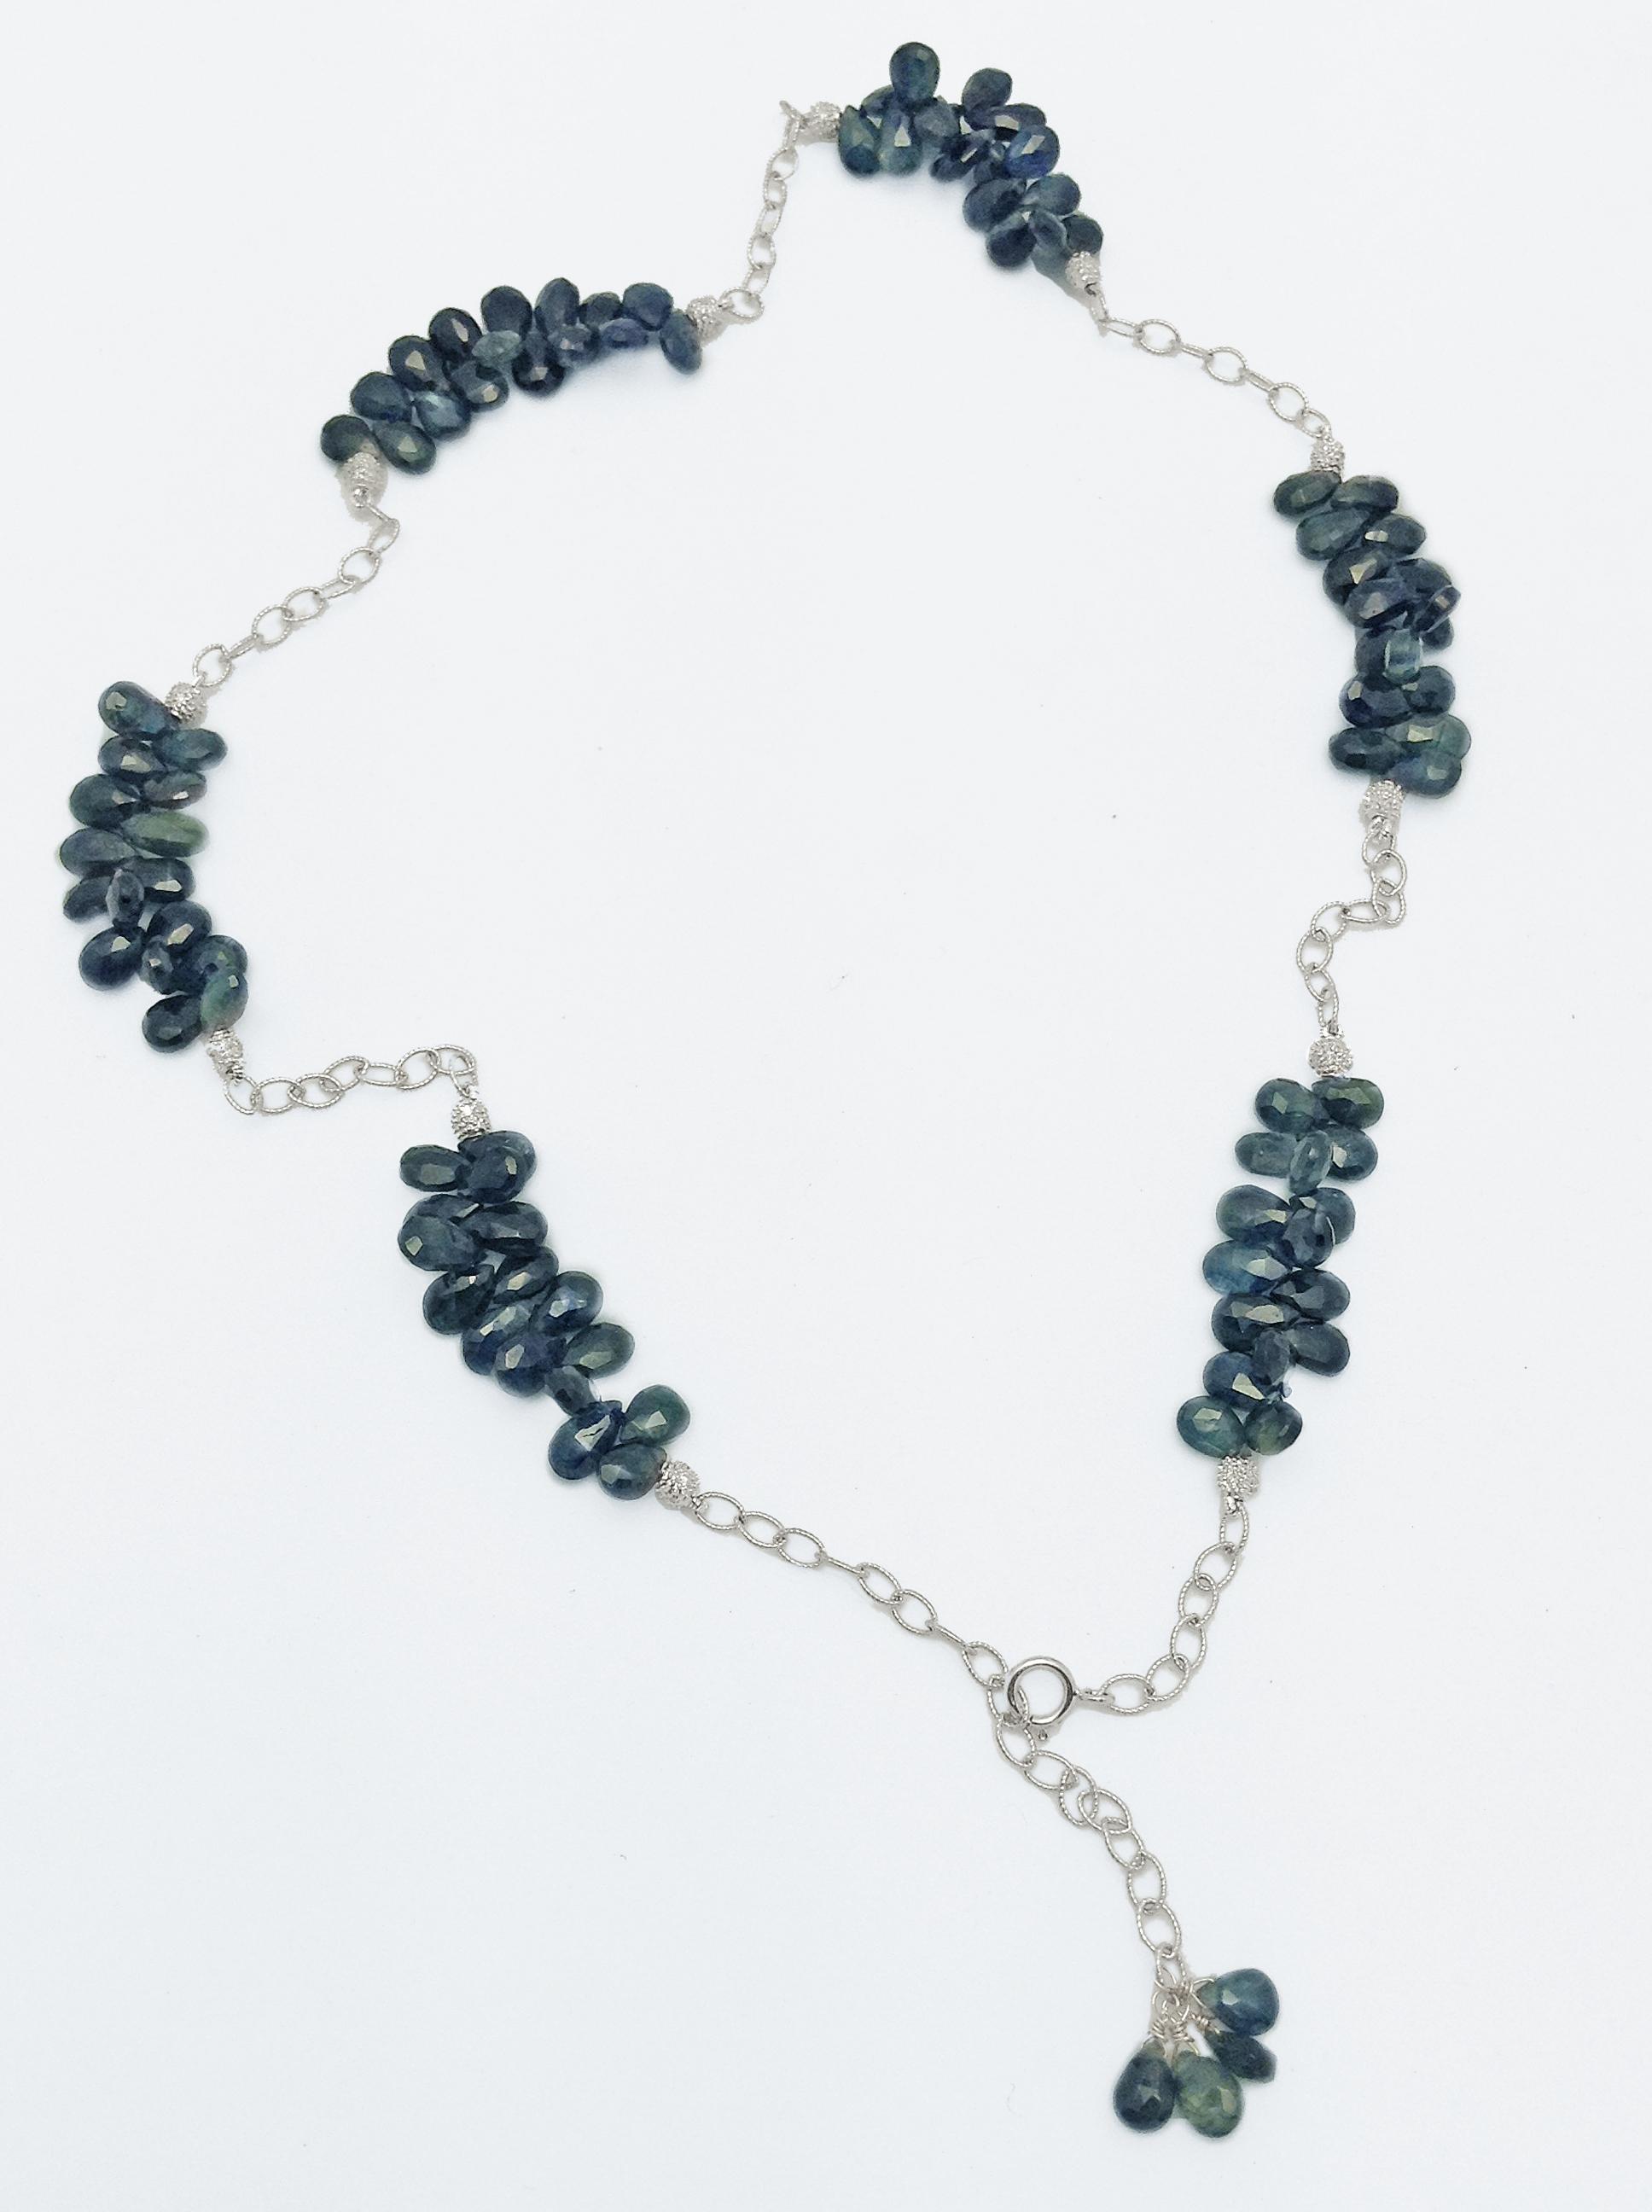 Pear Shaped Blue Sapphire Segments with Diamond Segments